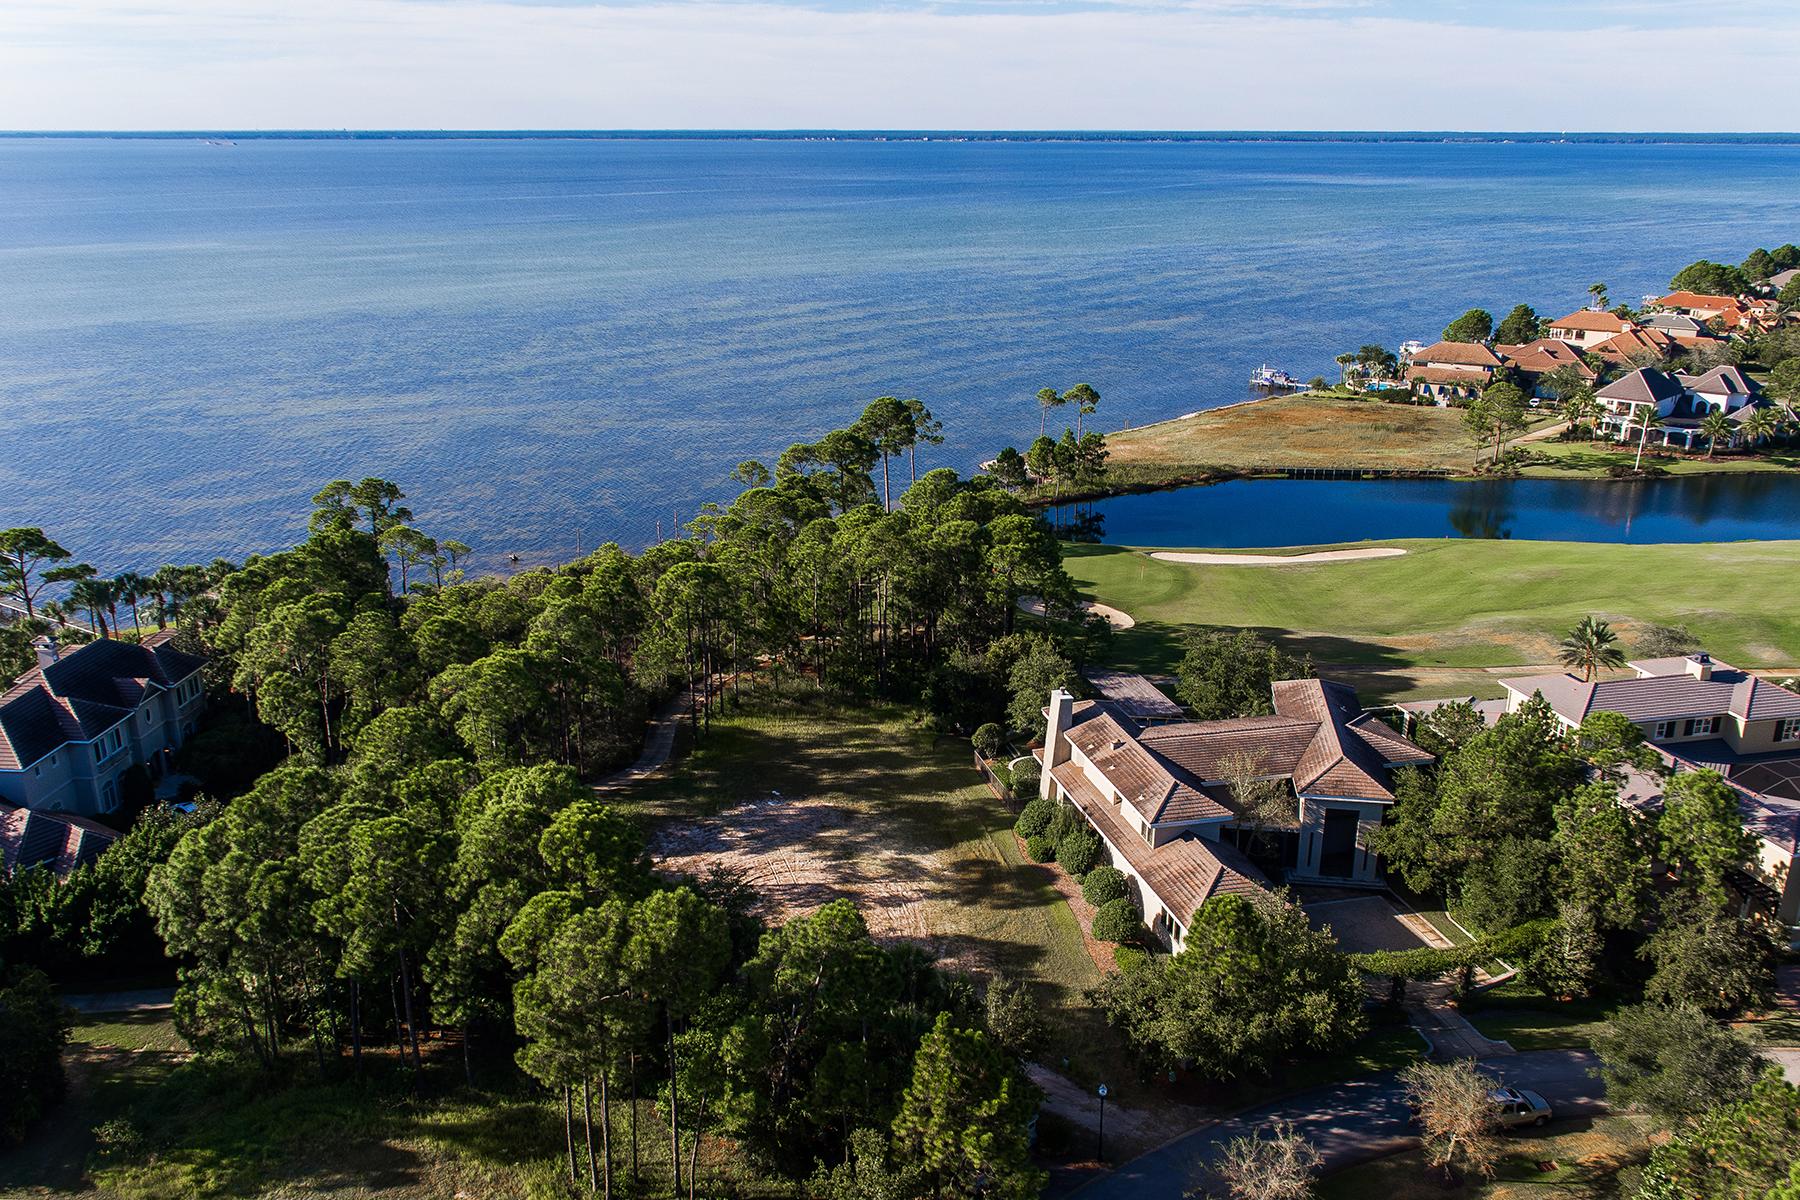 Земля для того Продажа на ESTATE SIZED LOT WITH BAY VIEWS IN GATED COMMUNITY 3256 Burnt Pine Cove Miramar Beach, Флорида, 32550 Соединенные Штаты